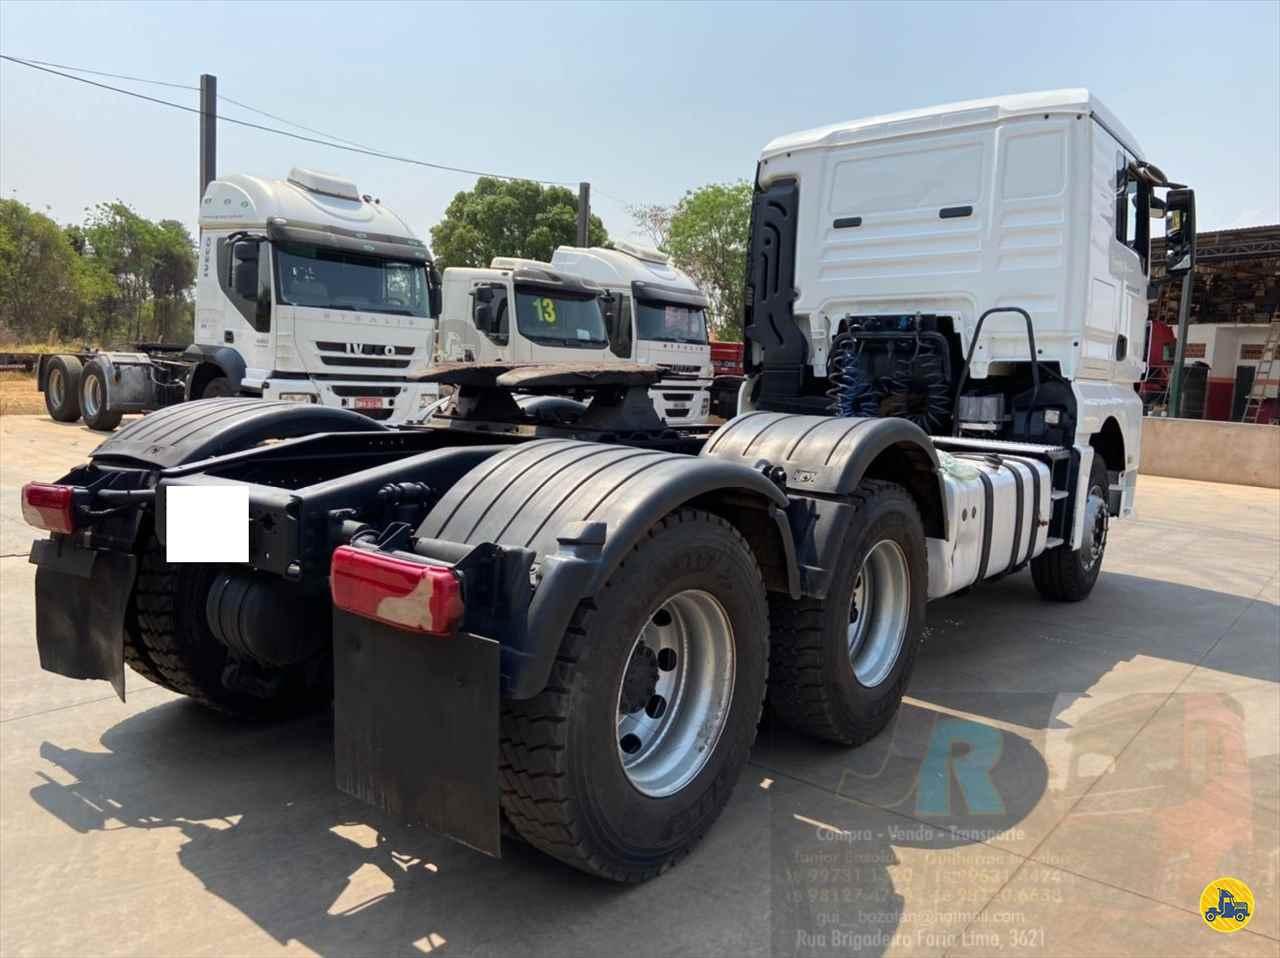 MAN TGX 29 440 401035km 2015/2016 Junior Bozolan Transportes